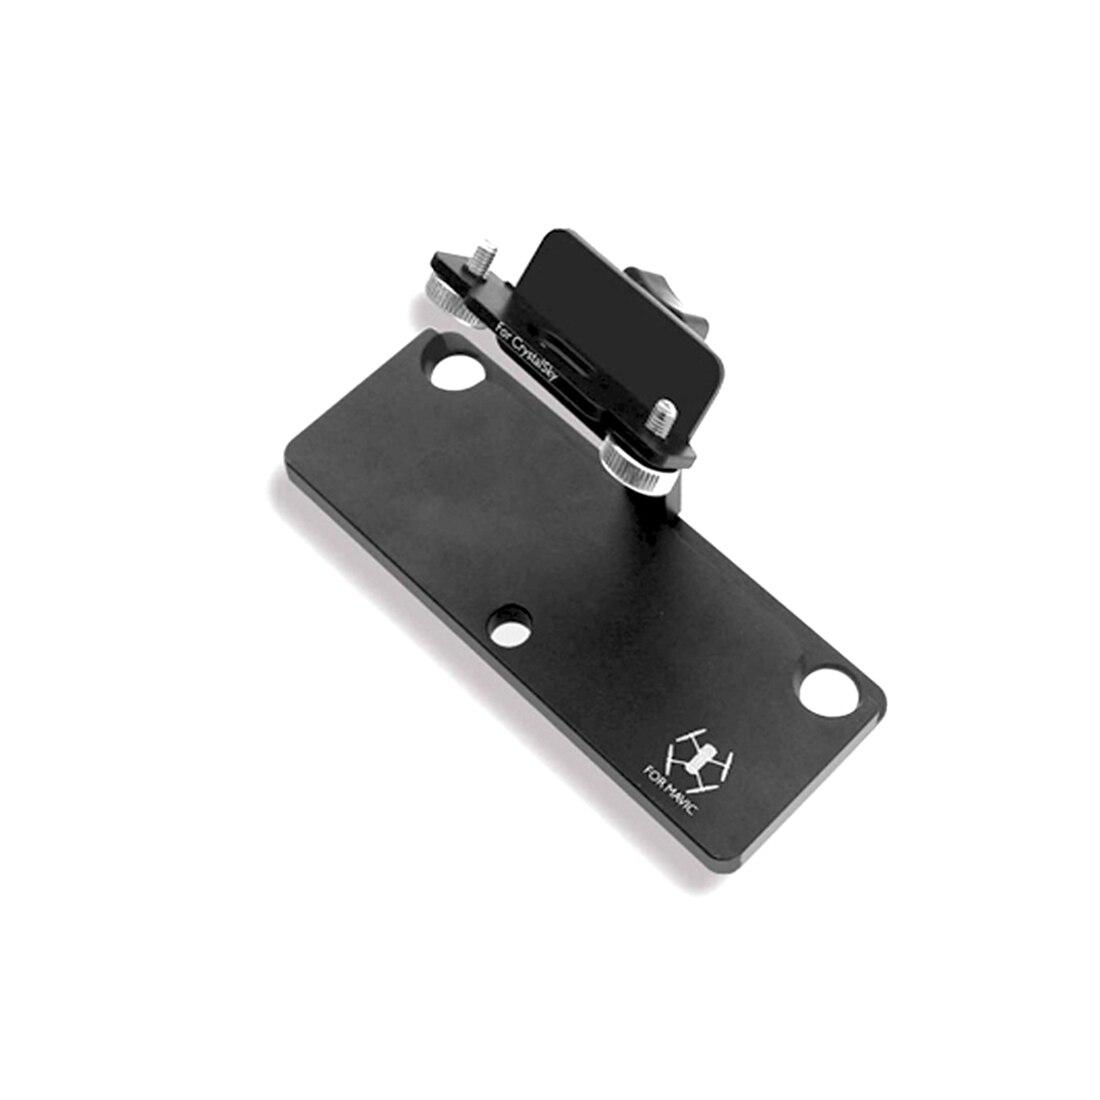 HOBBYINRC Monitor Holder Extension Aluminum Bracket Tablet Mount for 5.5 7.85 inch for DJI Spark For Mavic Pro Drone Accessories